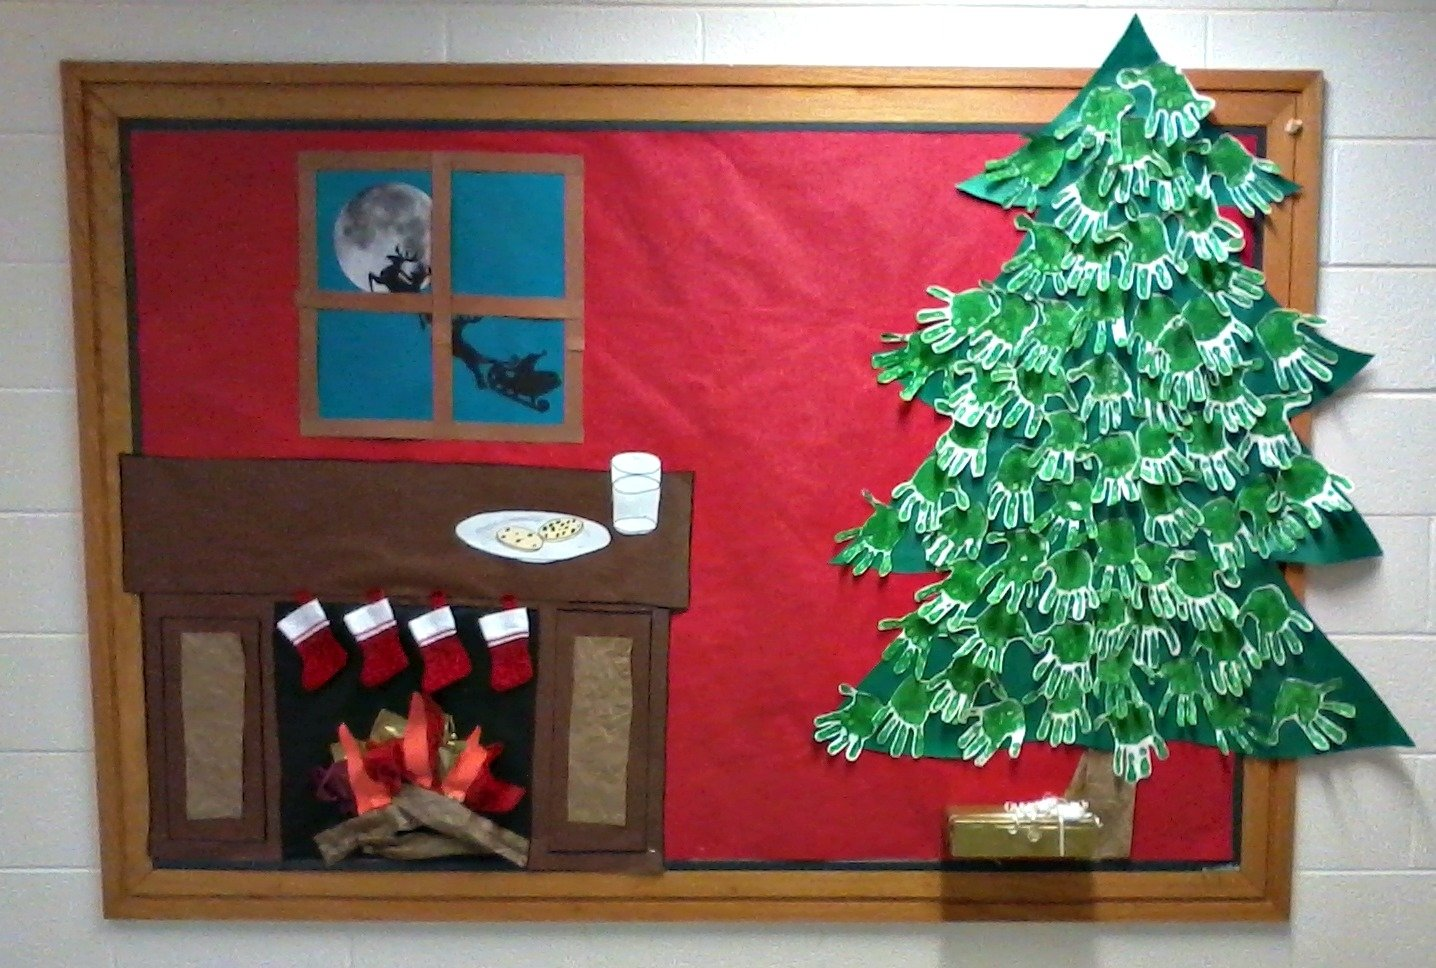 10 Attractive Christmas Tree Bulletin Board Ideas on christmas night holiday bulletin board idea supplyme 1 2021